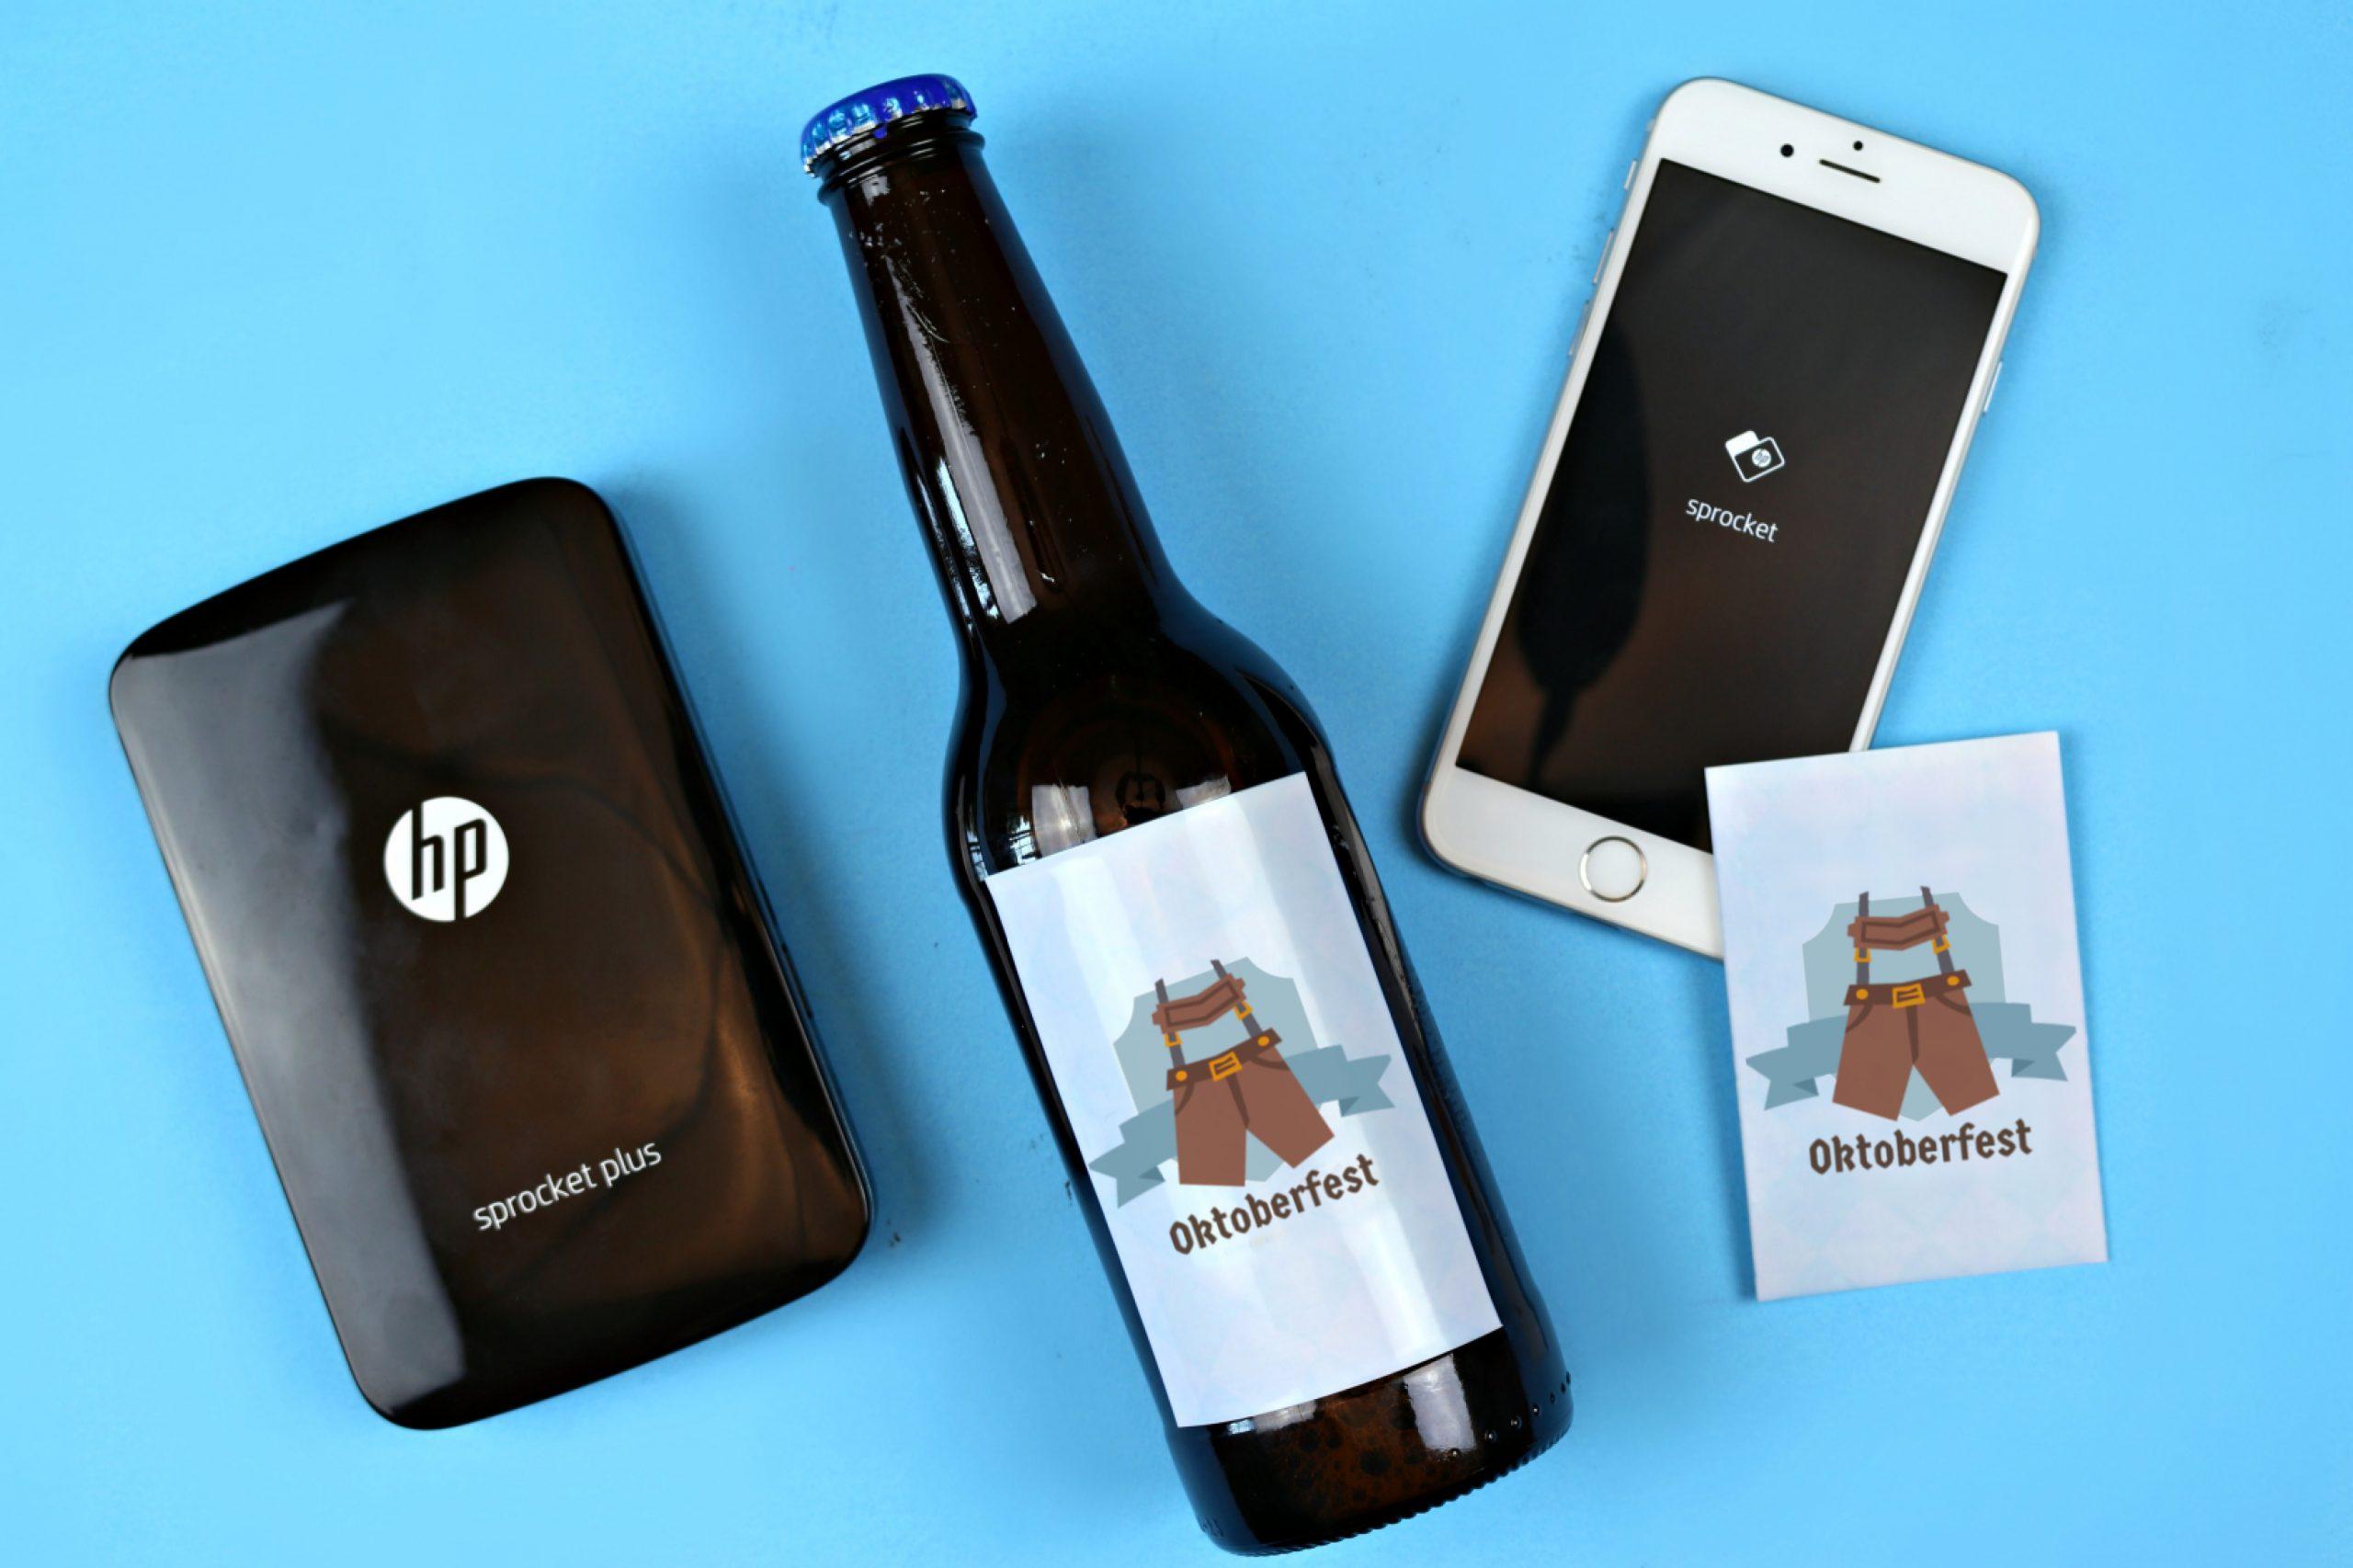 HP Sprocket, smartphone, Oktoberfest sticker and a beer bottle on a blue background